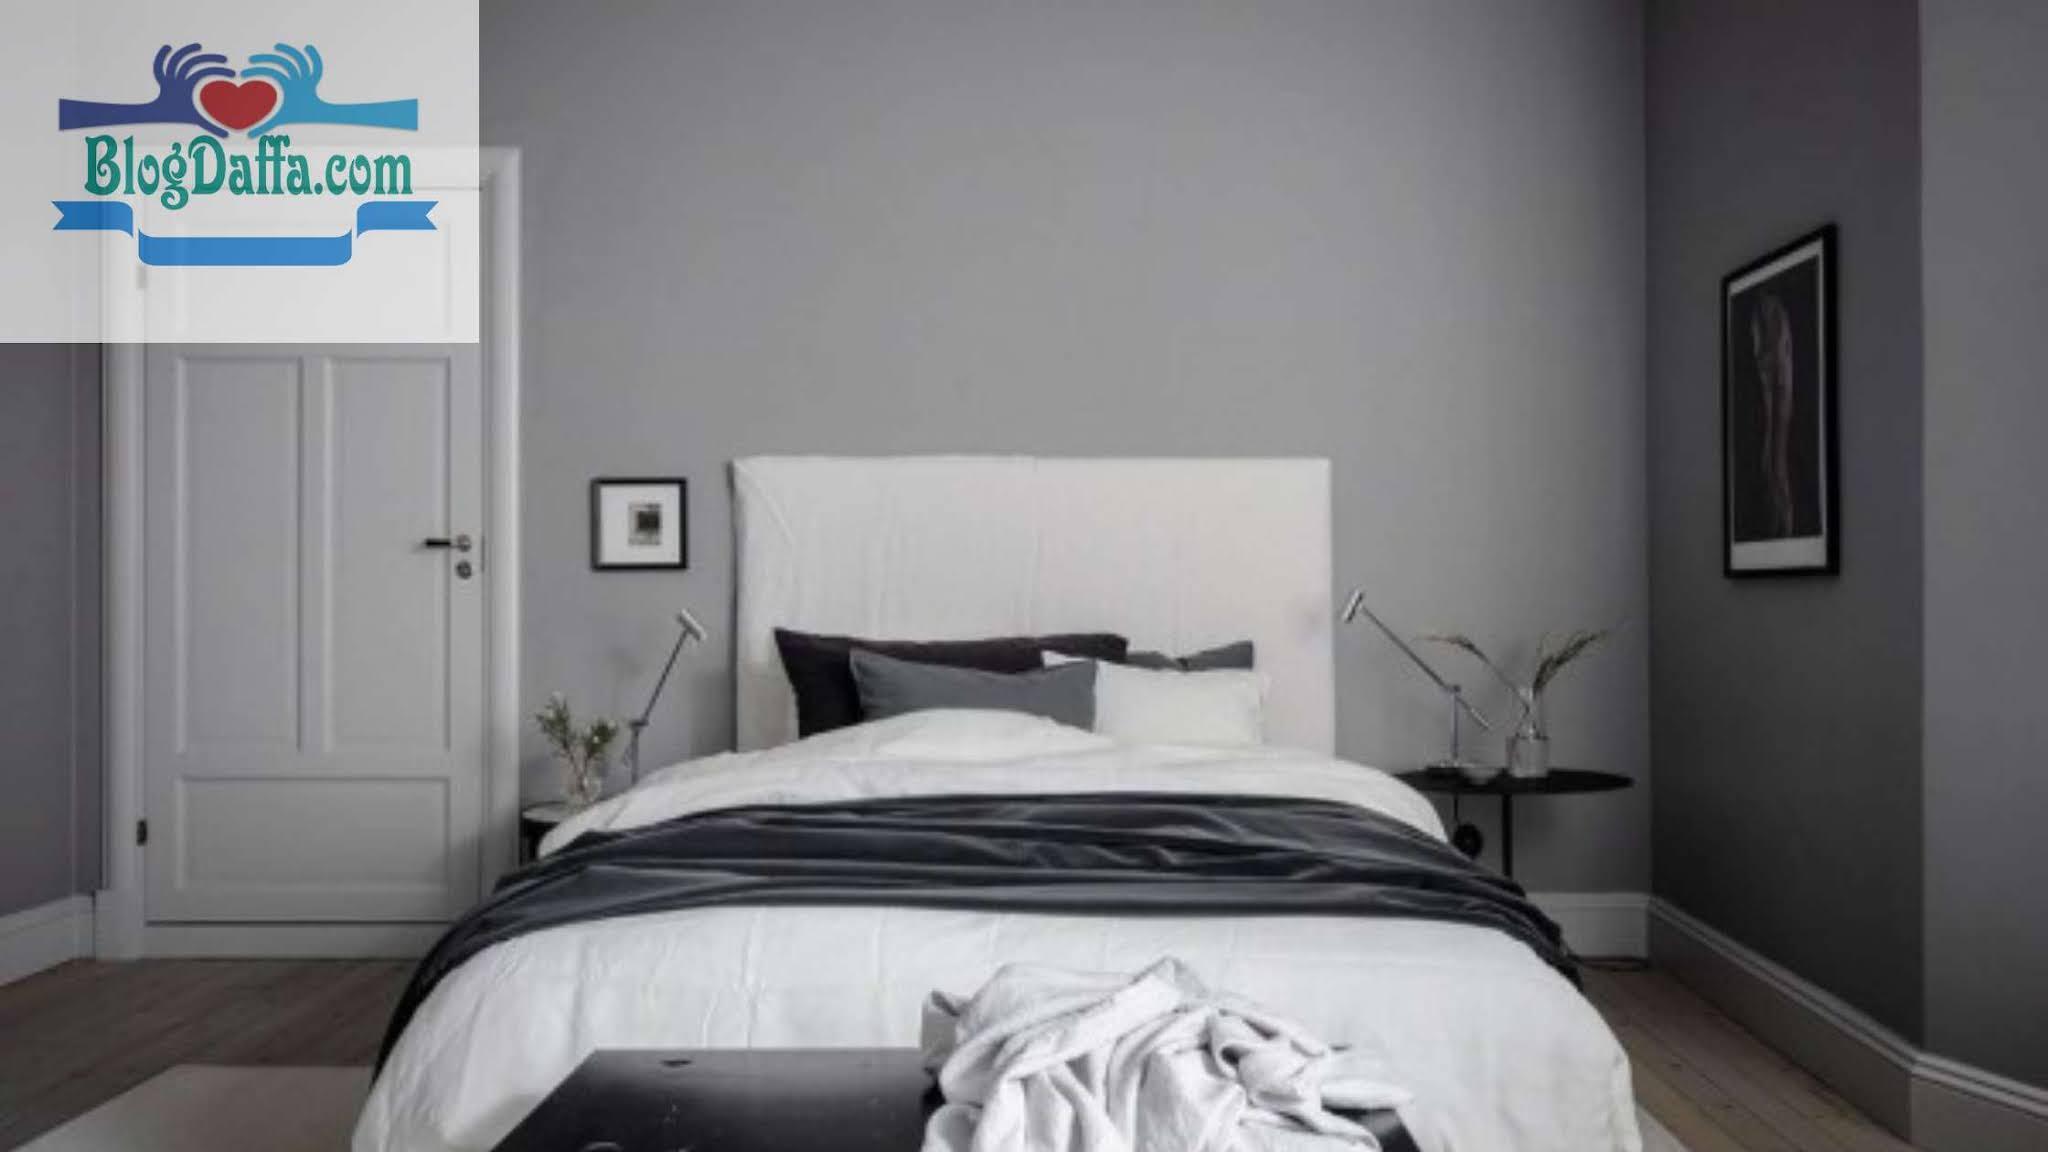 Warna cat kamar tidur abu-abu